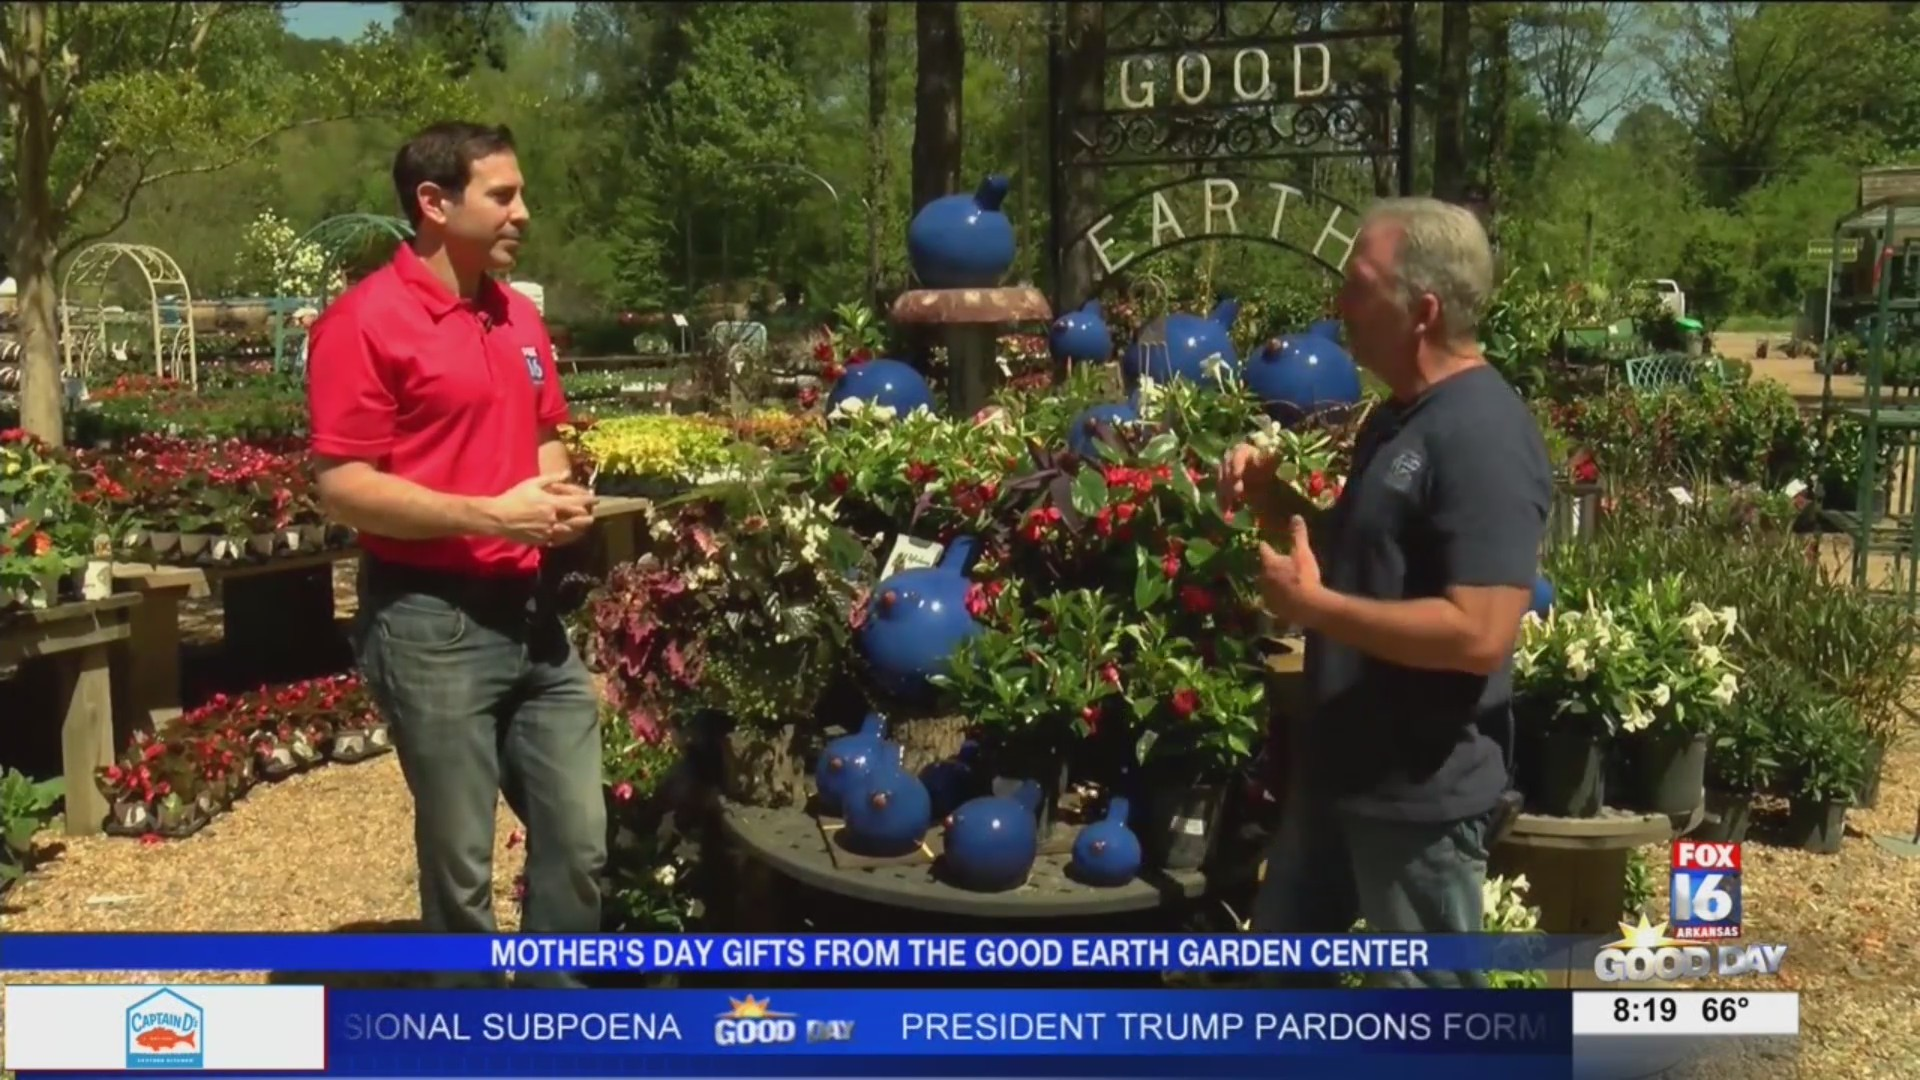 Good_Earth_Garden_Center__Mother_s_Day_G_0_20190508132630